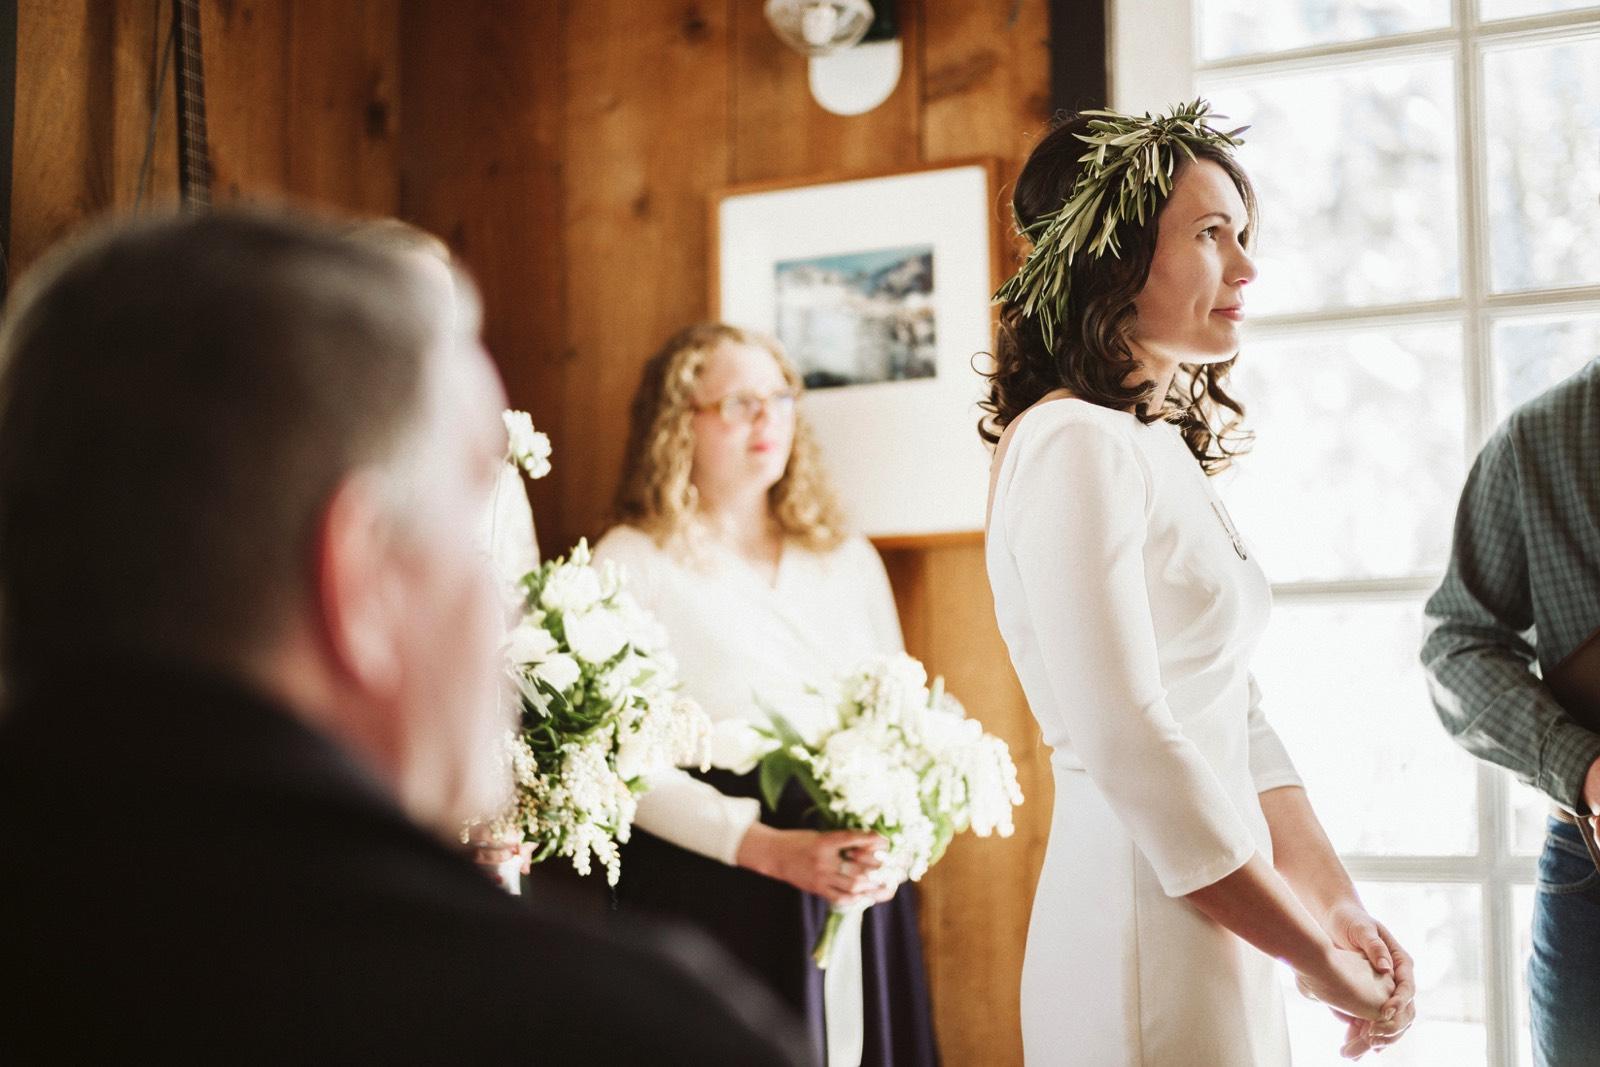 alpine-lakes-high-camp-winter-wedding-36 ALPINE LAKES HIGH CAMP WEDDING